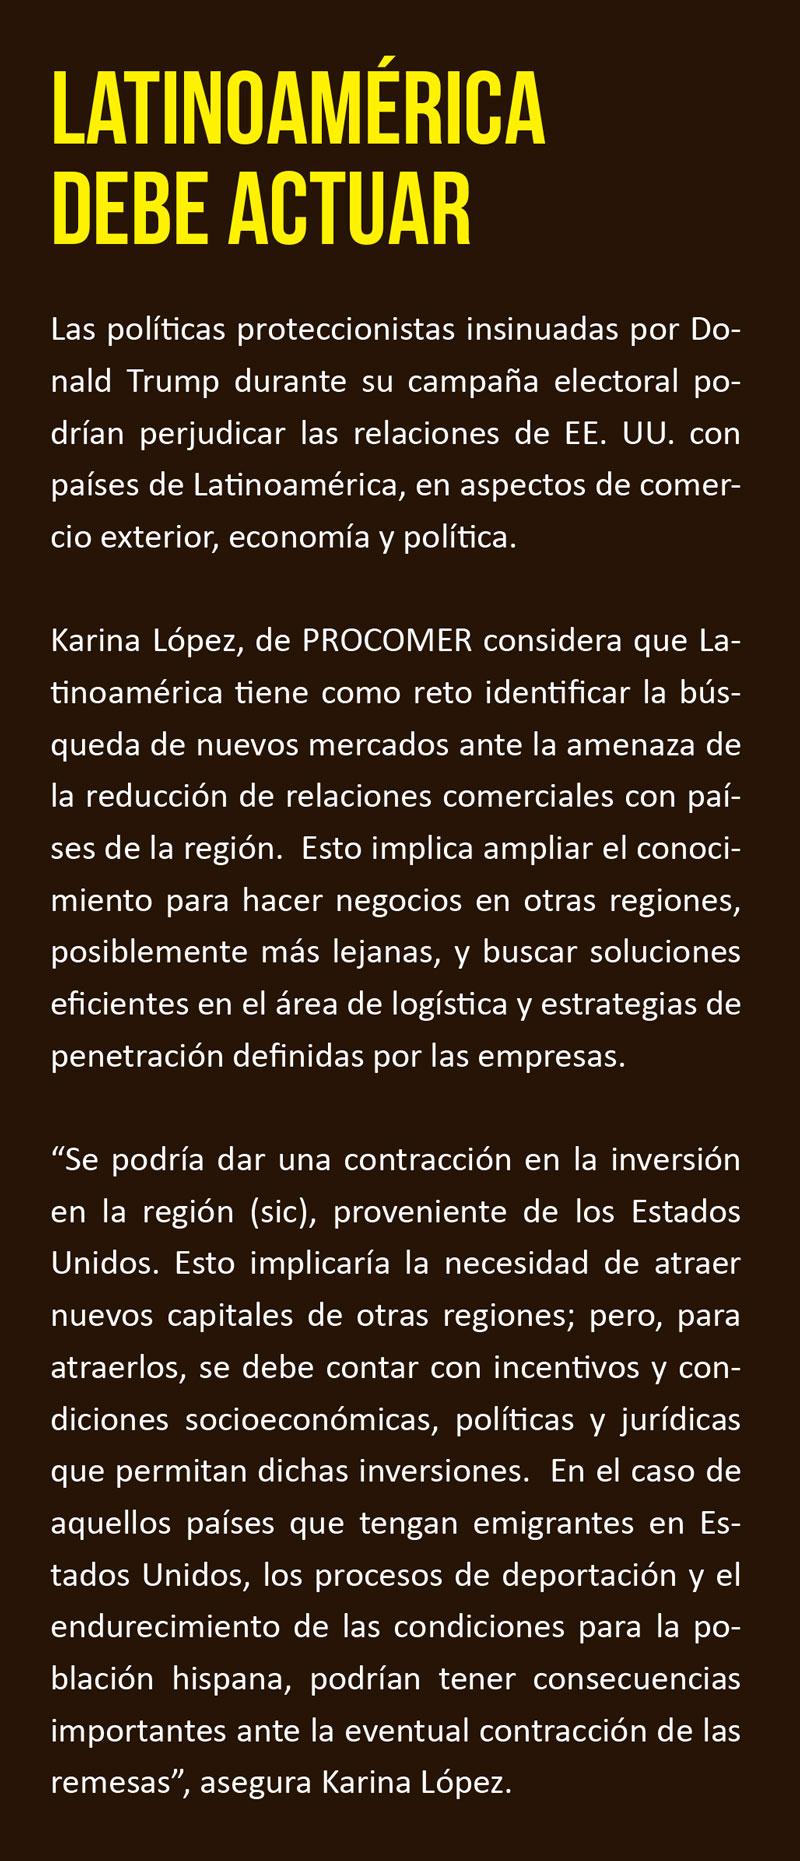 Latinoamérica debe actuar